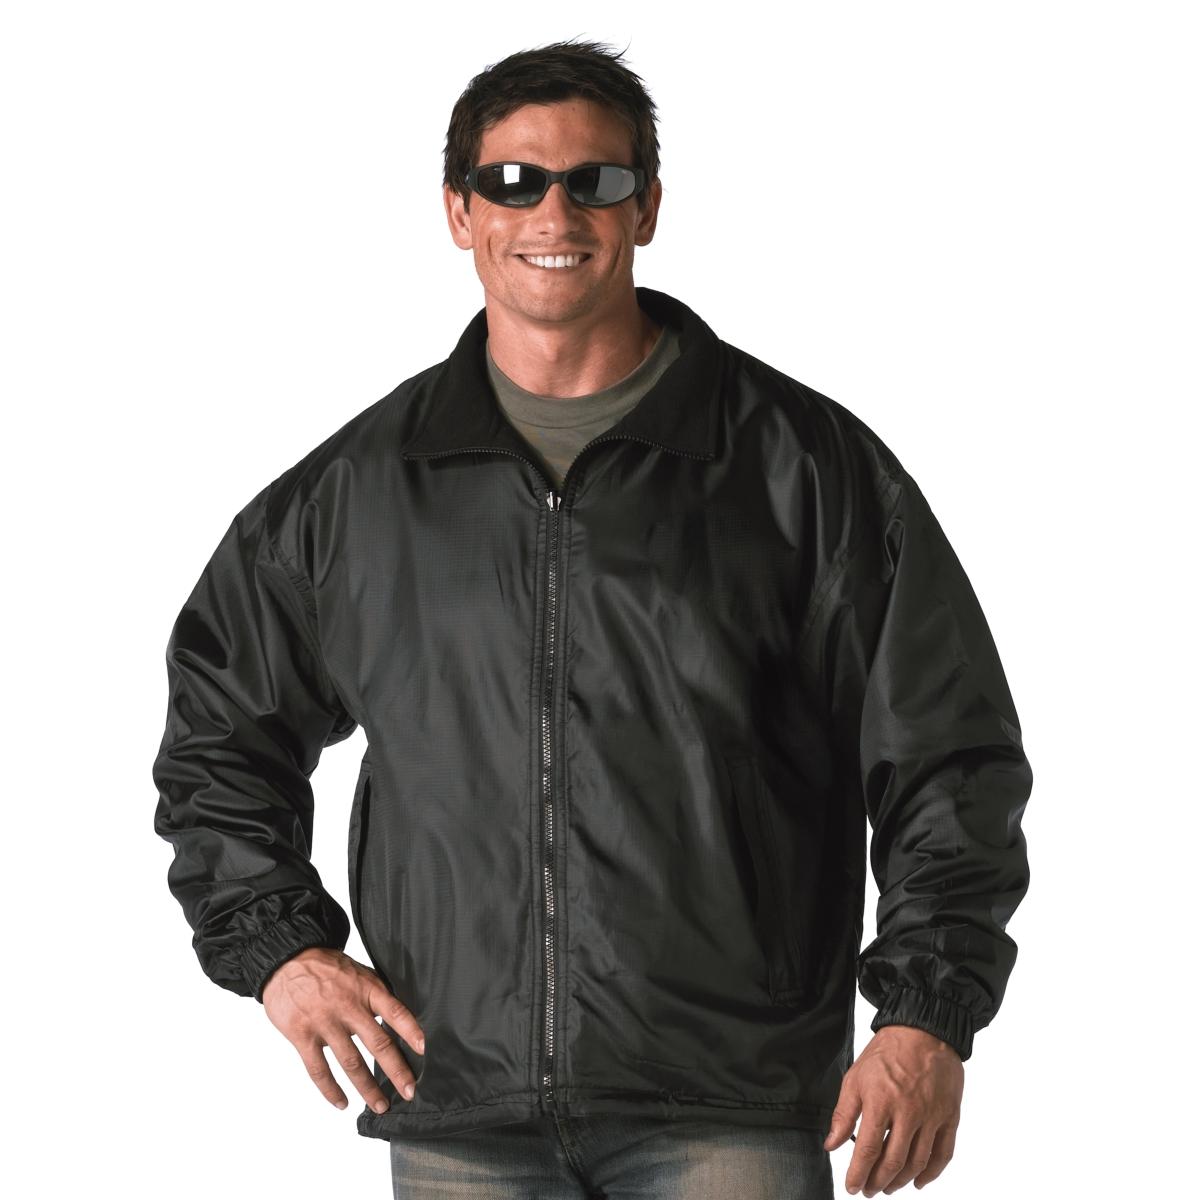 Rothco Mens Black Reversible Jacket, Fleece Windbreaker, Coat at Sears.com